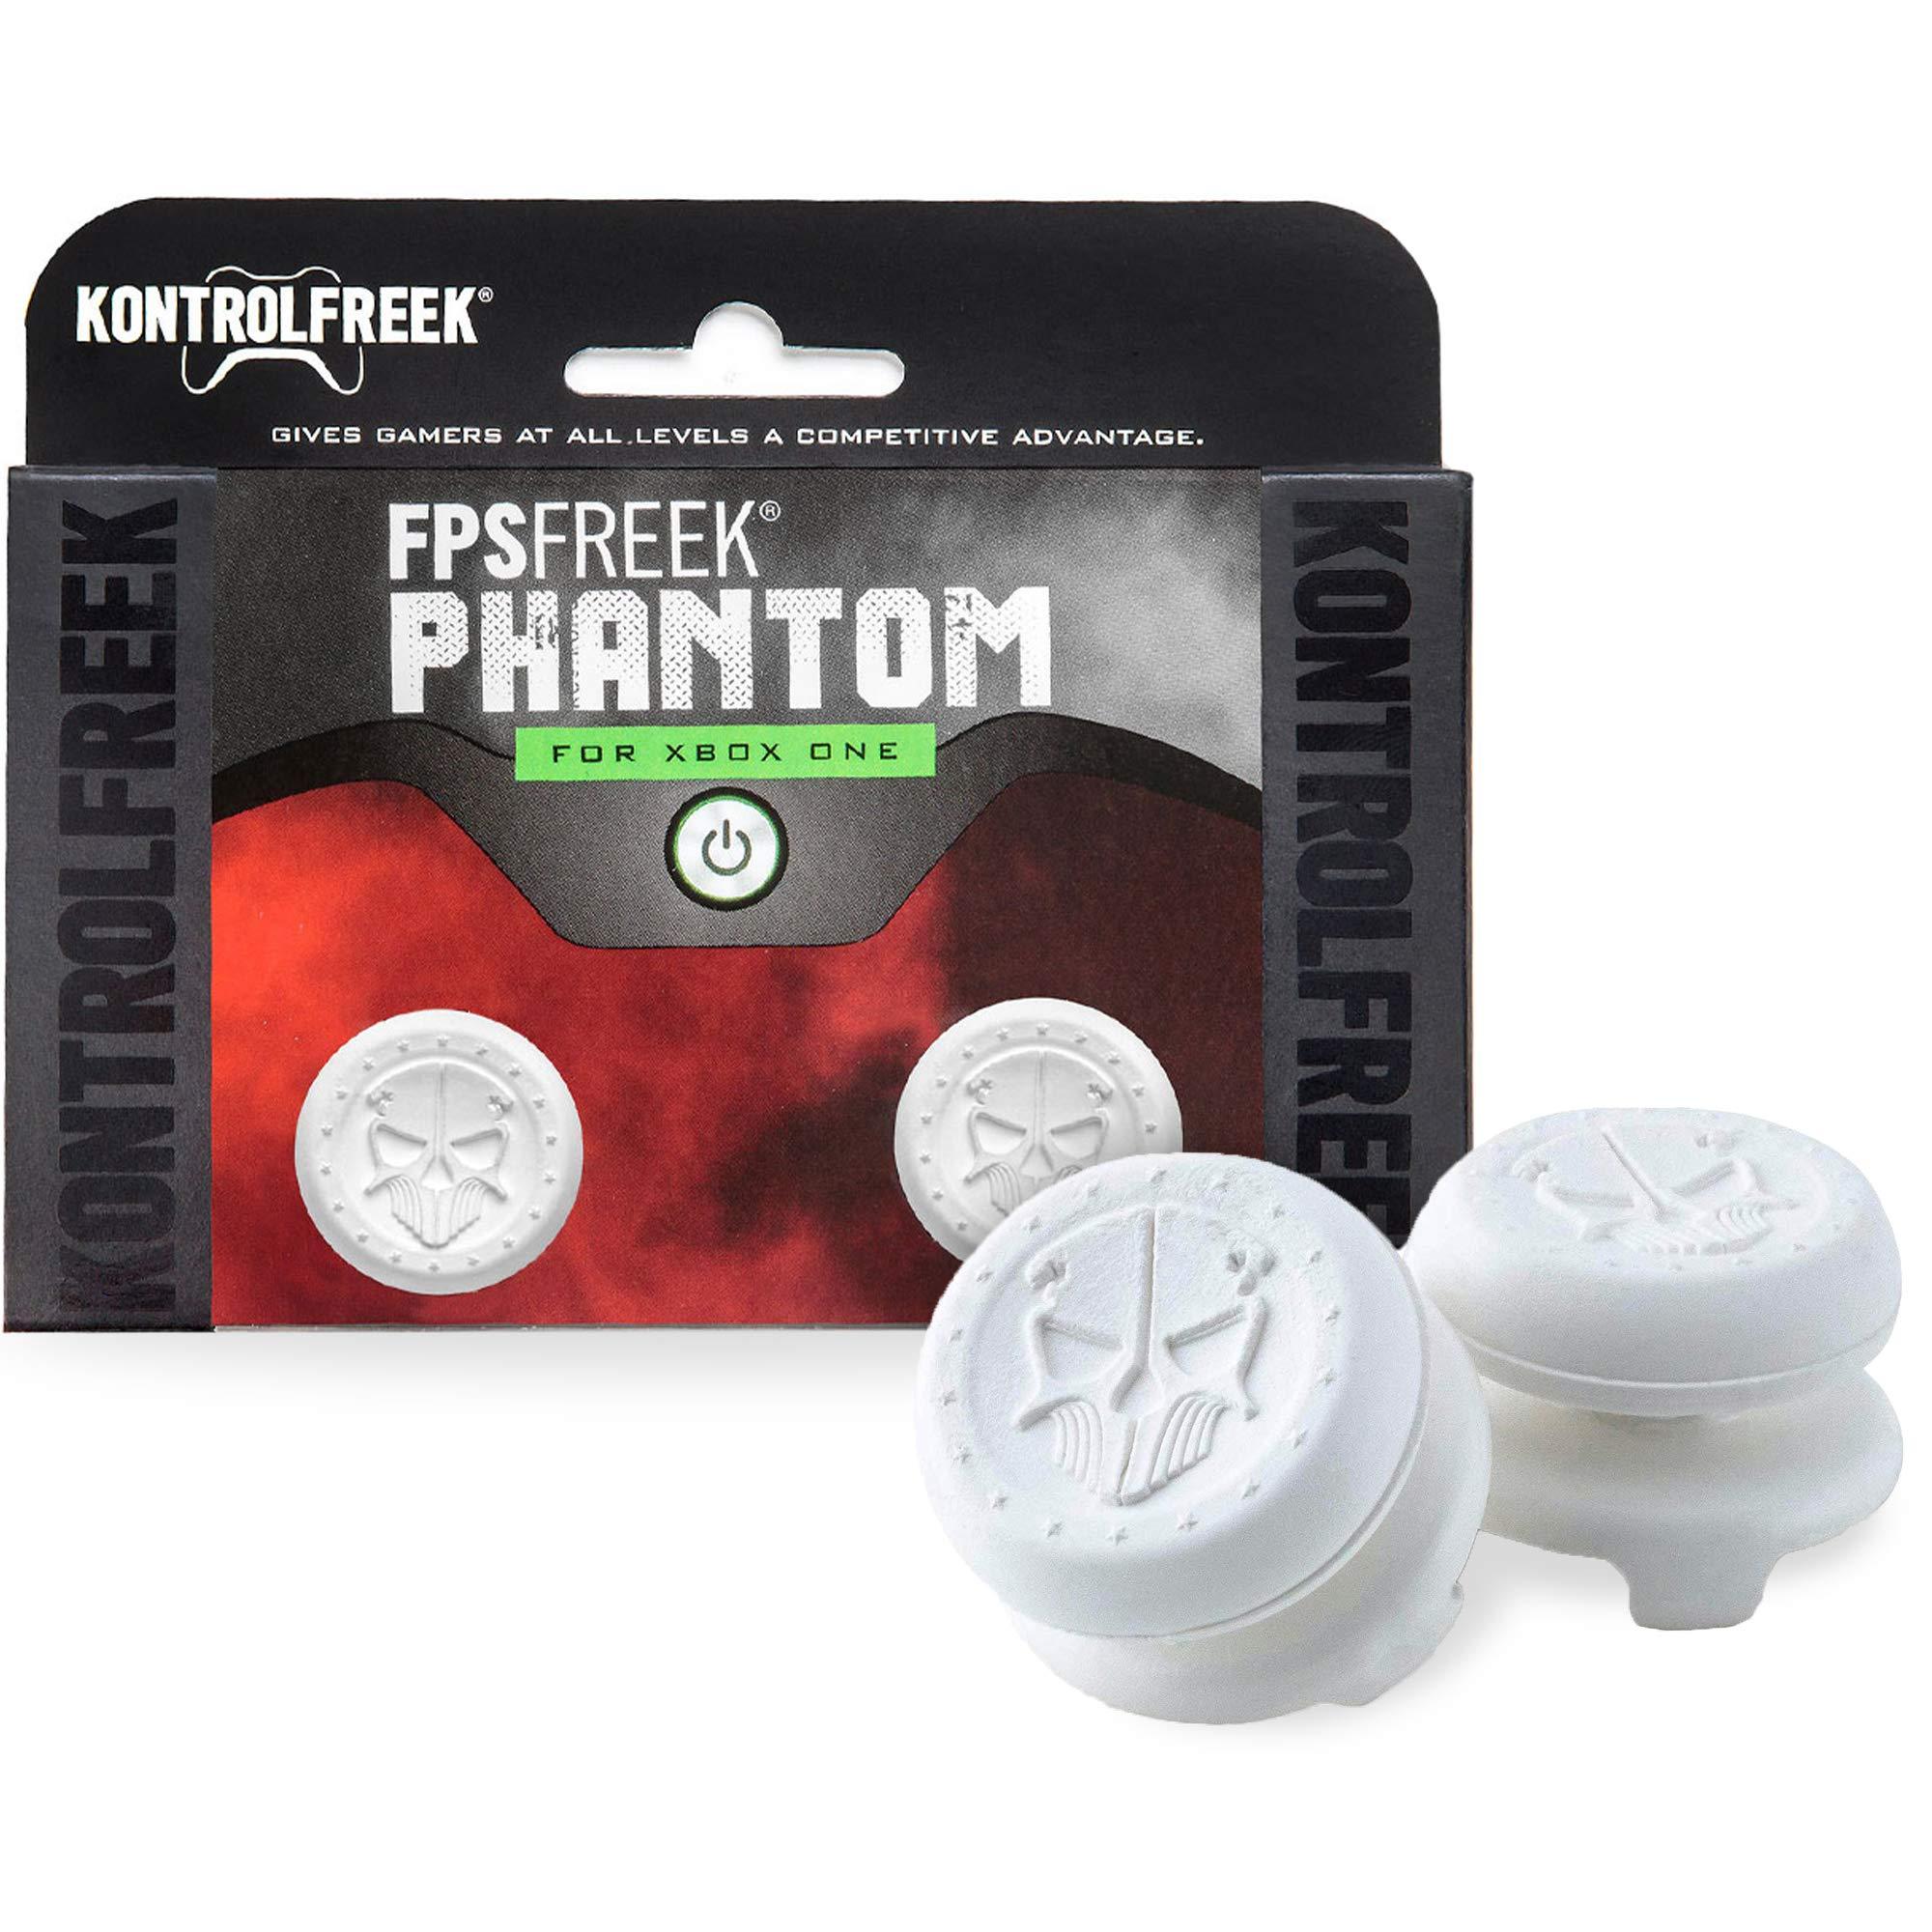 KontrolFreek FPS Freek Phantom for Xbox One Controller | Performance Thumbsticks | 2 High-Rise Concave | White by KontrolFreek